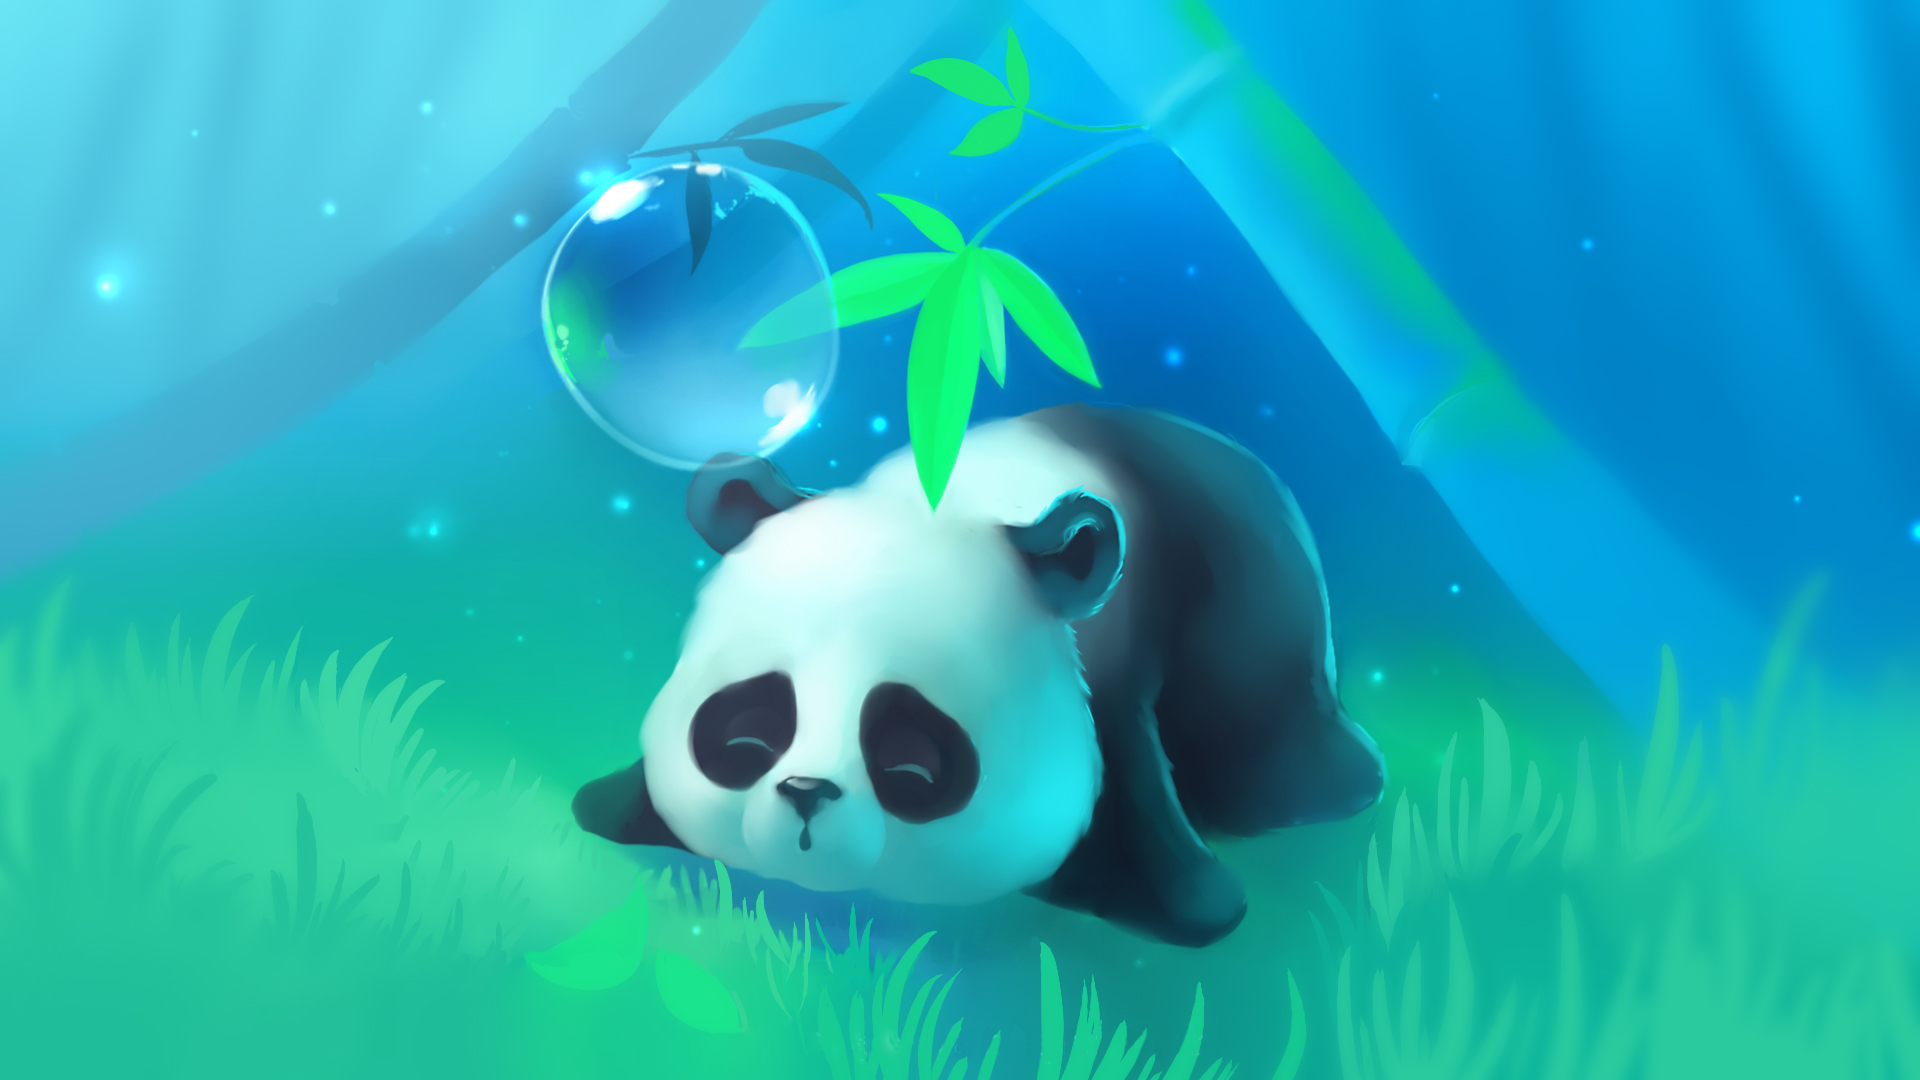 Panda Fond d'écran HD | Arrière-Plan | 1920x1080 | ID:732624 - Wallpaper Abyss